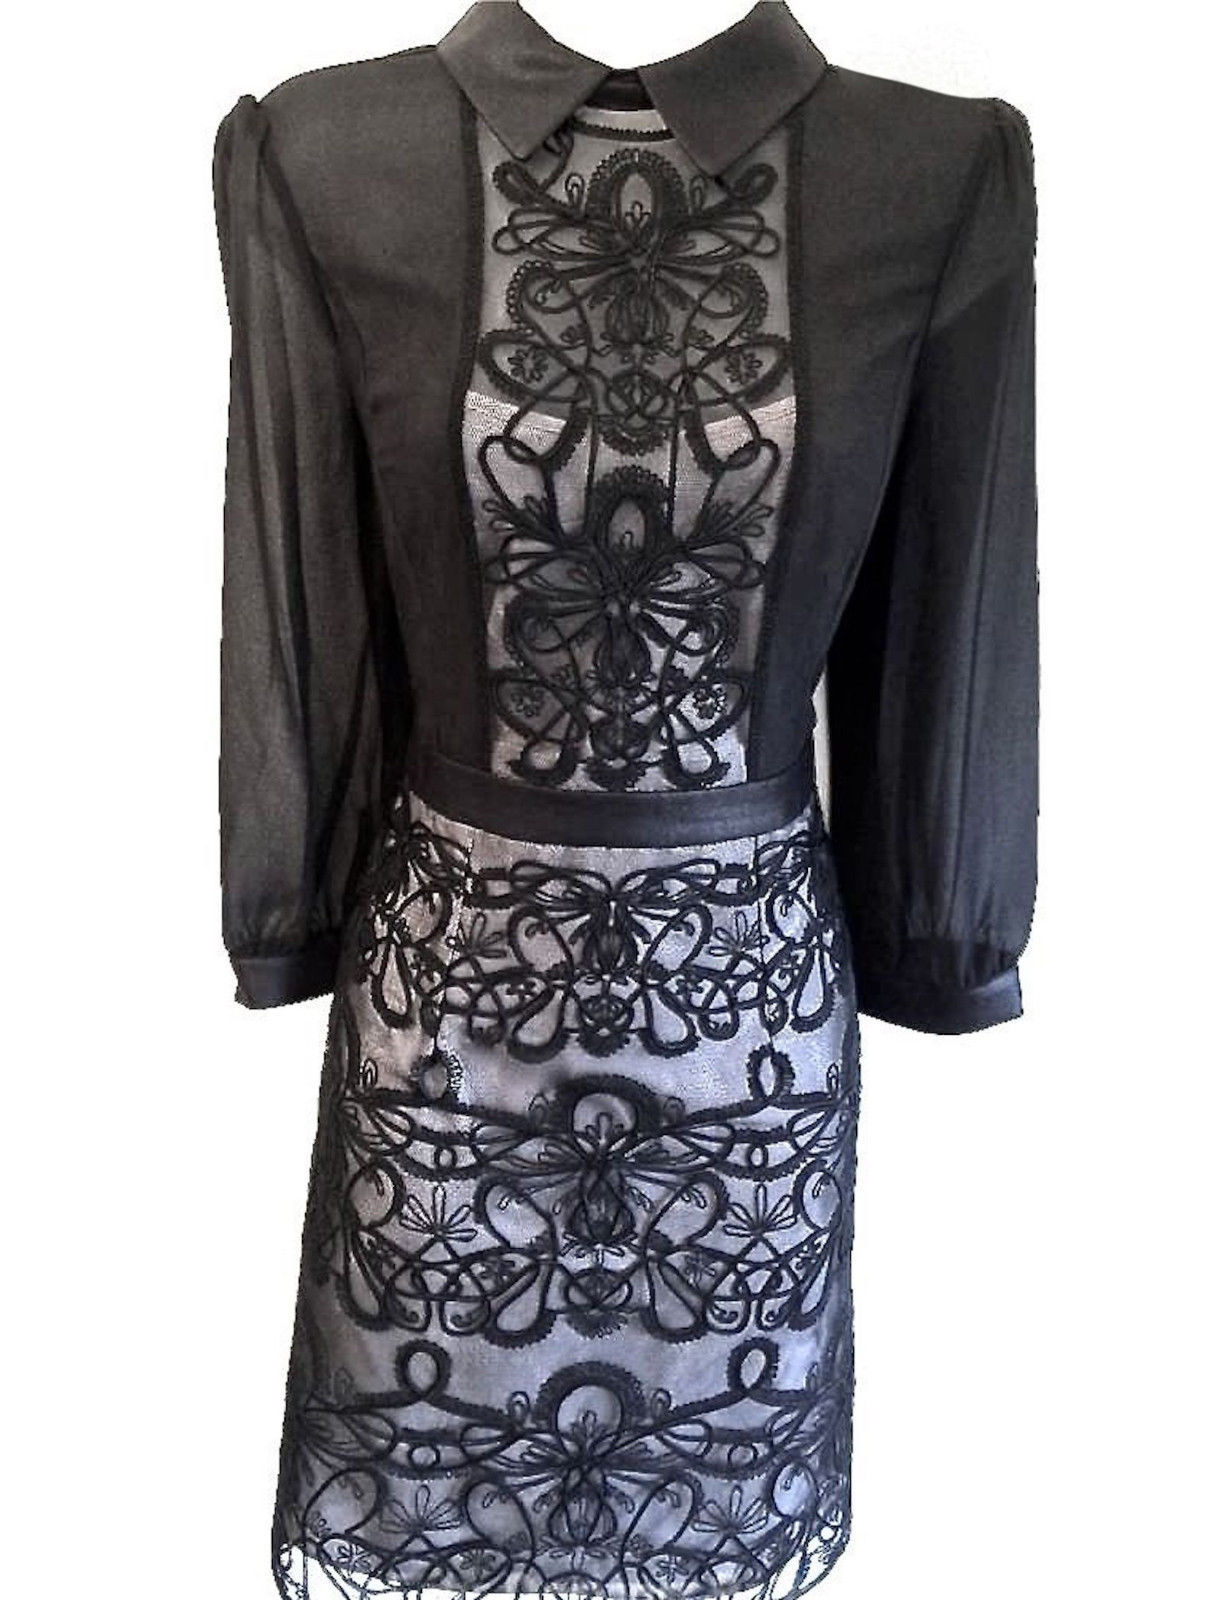 Dr karen millen graphic lace embroidery shirt dress black